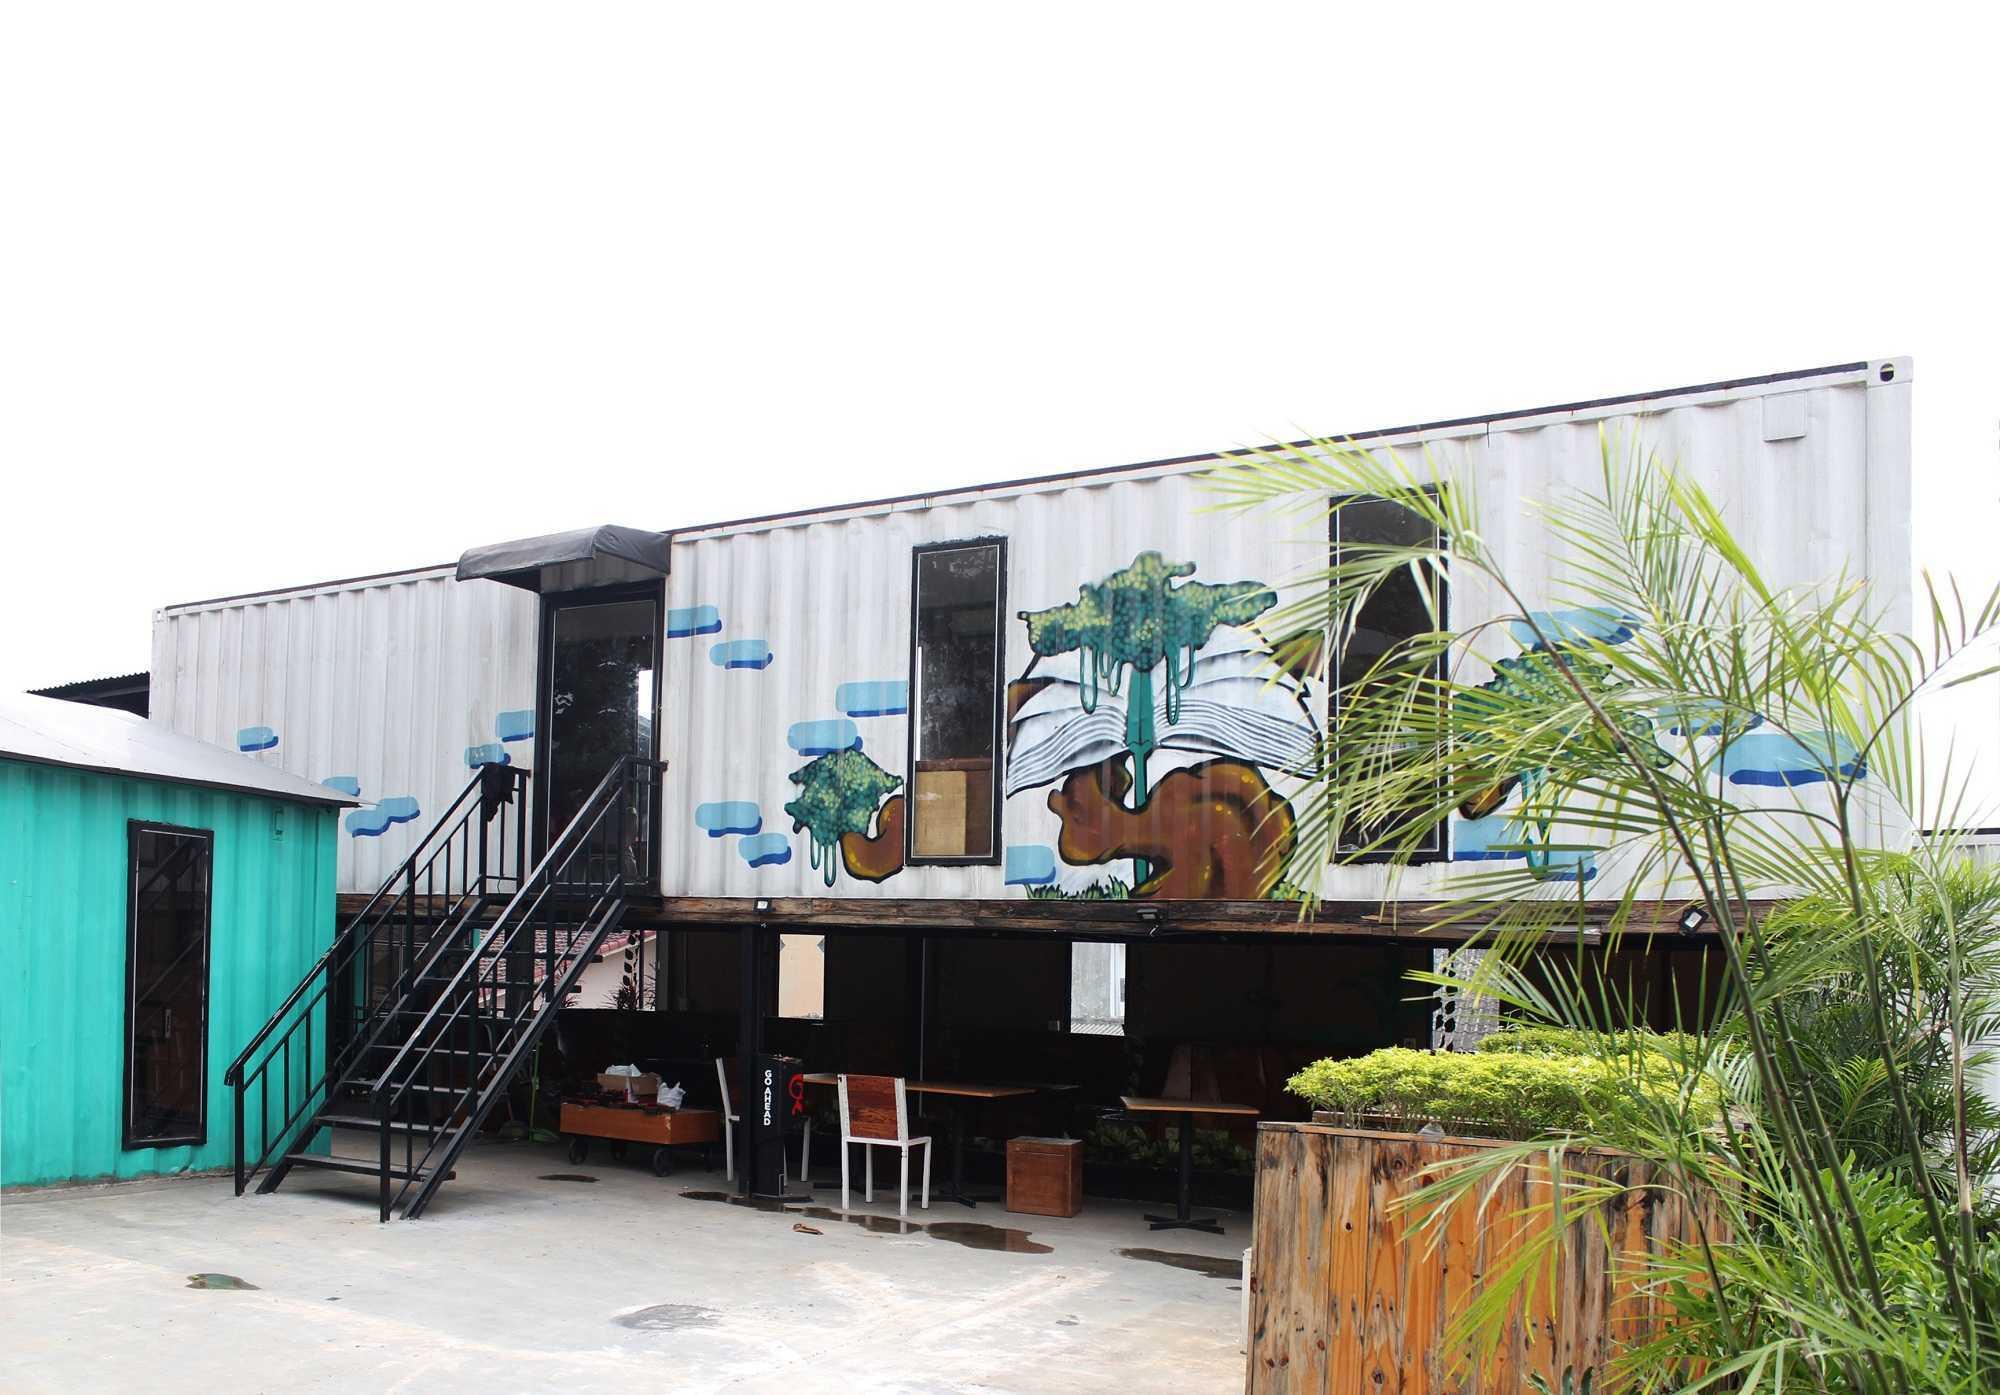 Braun Studio Northstars Cafe Medan Jl. Jamin Ginting, Padang Bulan, Medan Baru, Kota Medan, Sumatera Utara 20157, Indonesia Medan Sisingamangaraja Braun-Studio-Northstars-Cafe-Medan   57169